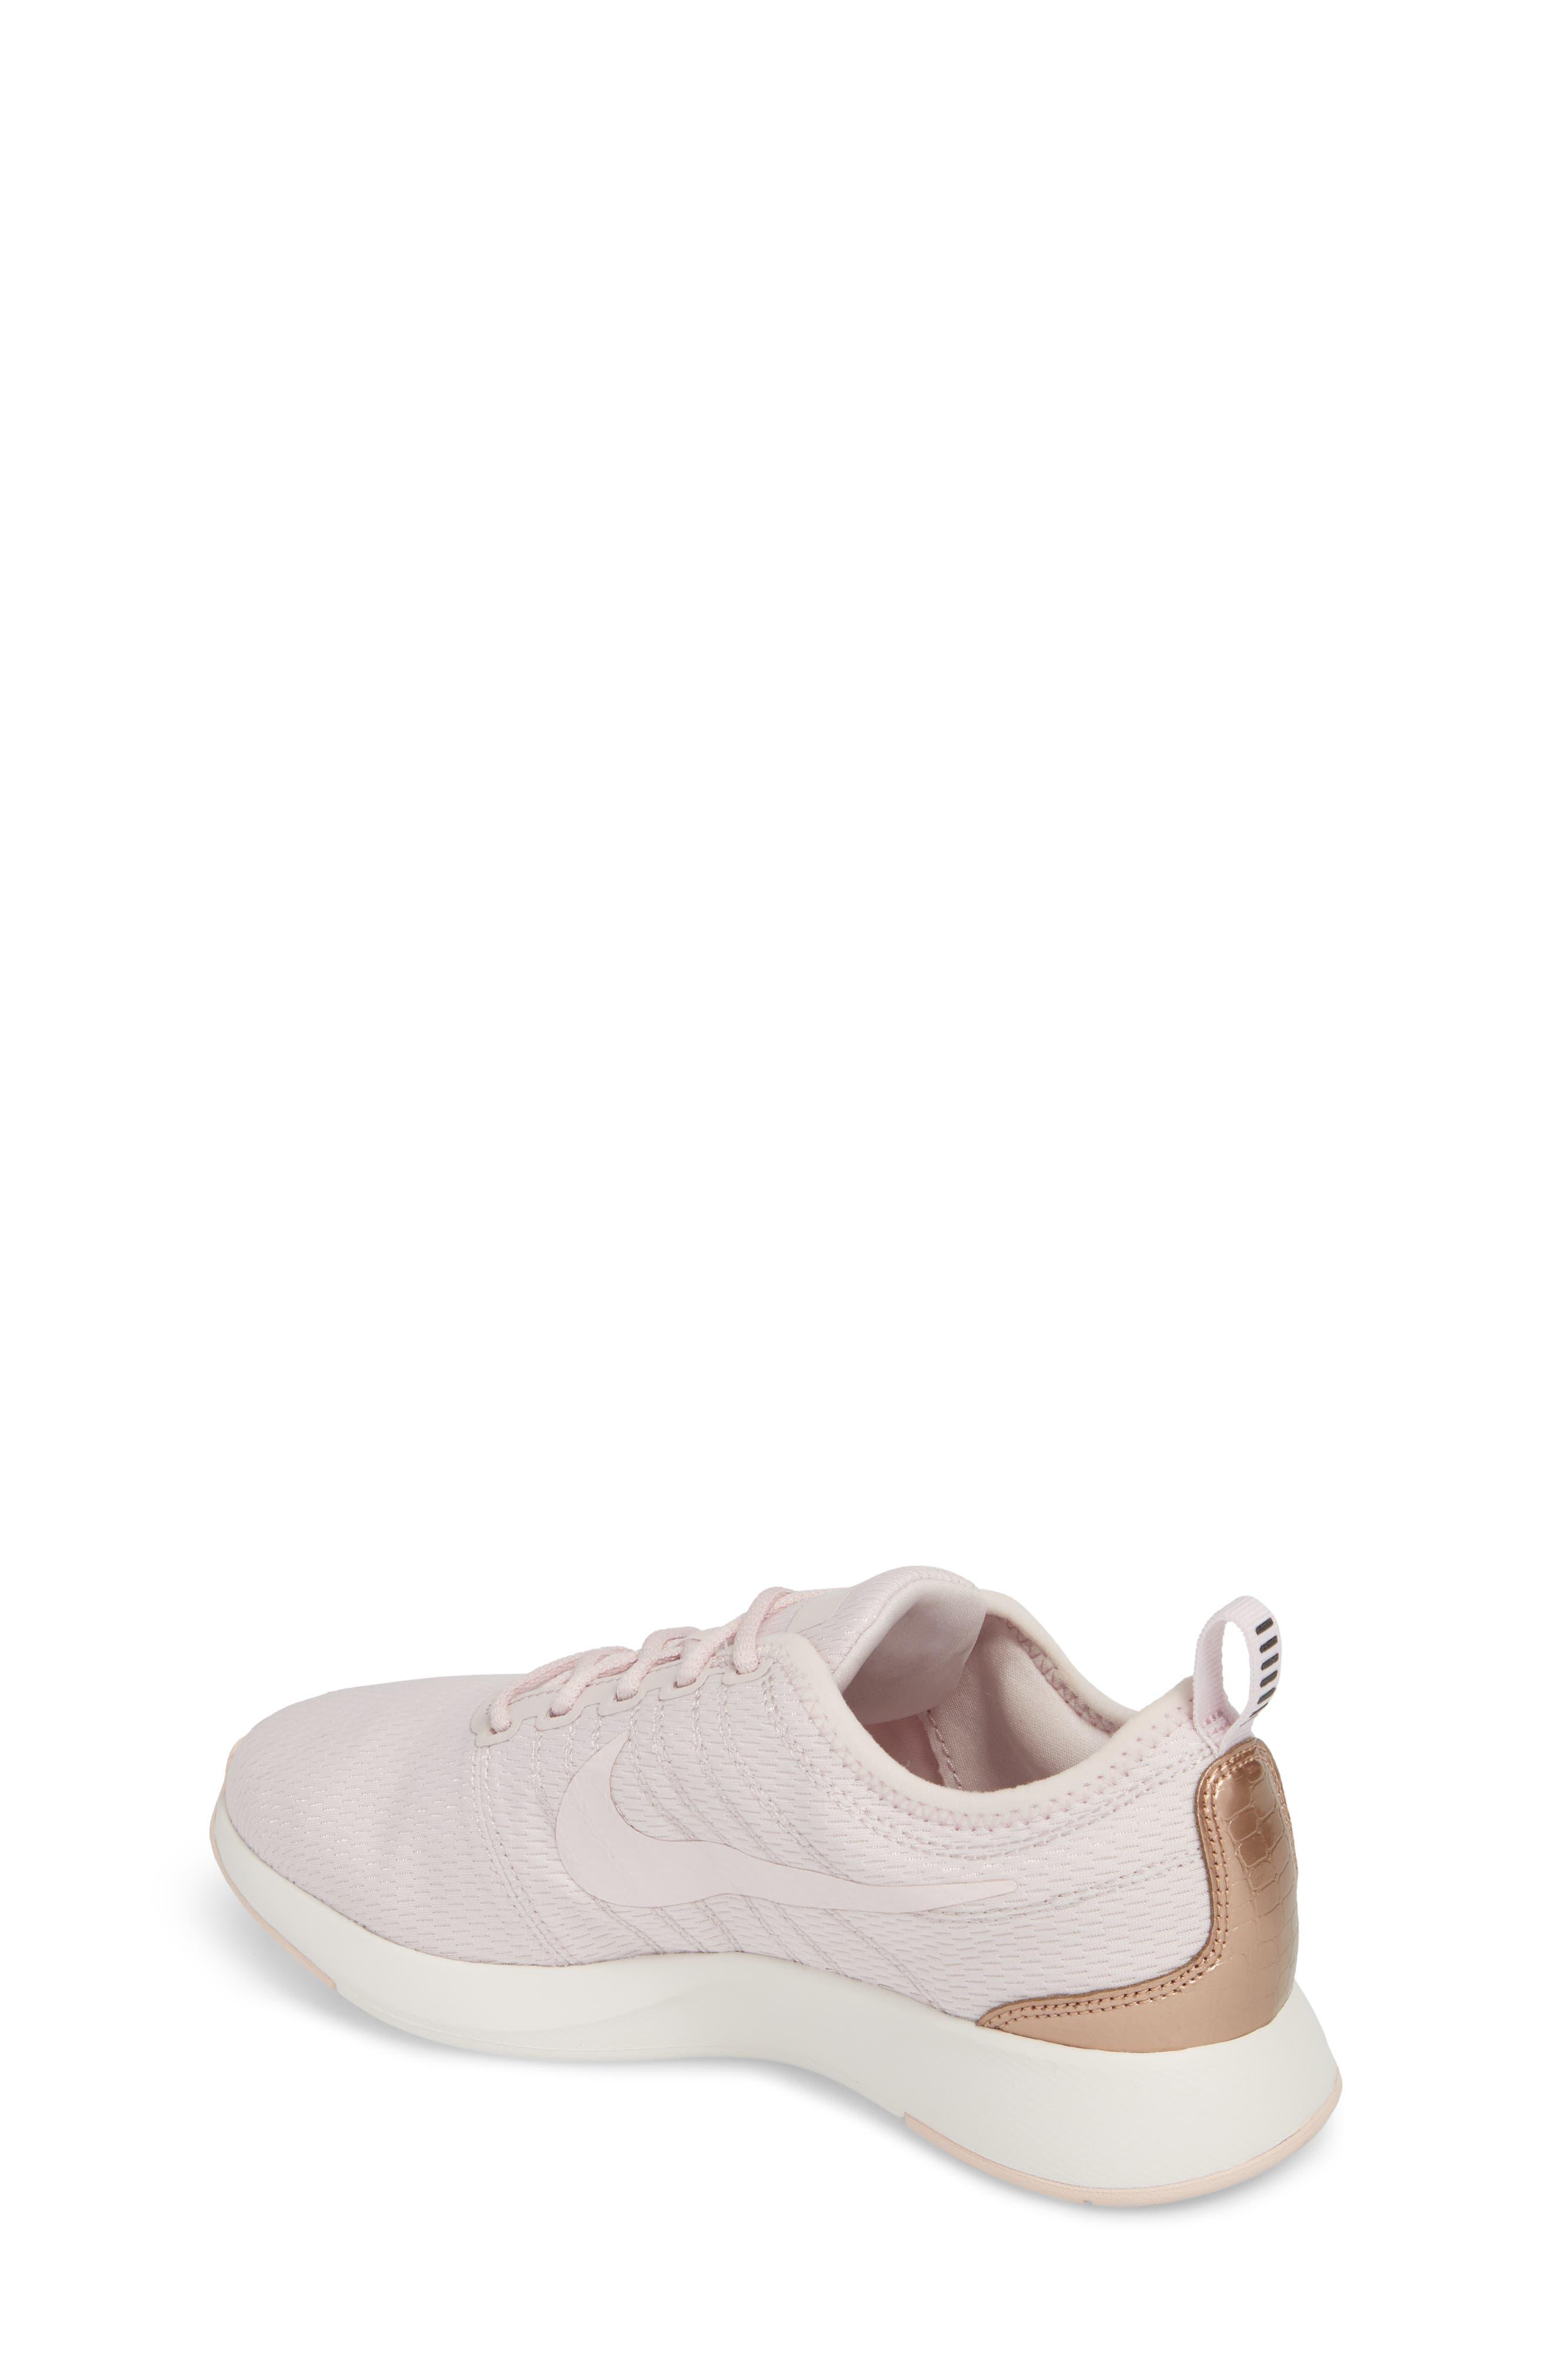 Dualtone Racer GS Sneaker,                             Alternate thumbnail 5, color,